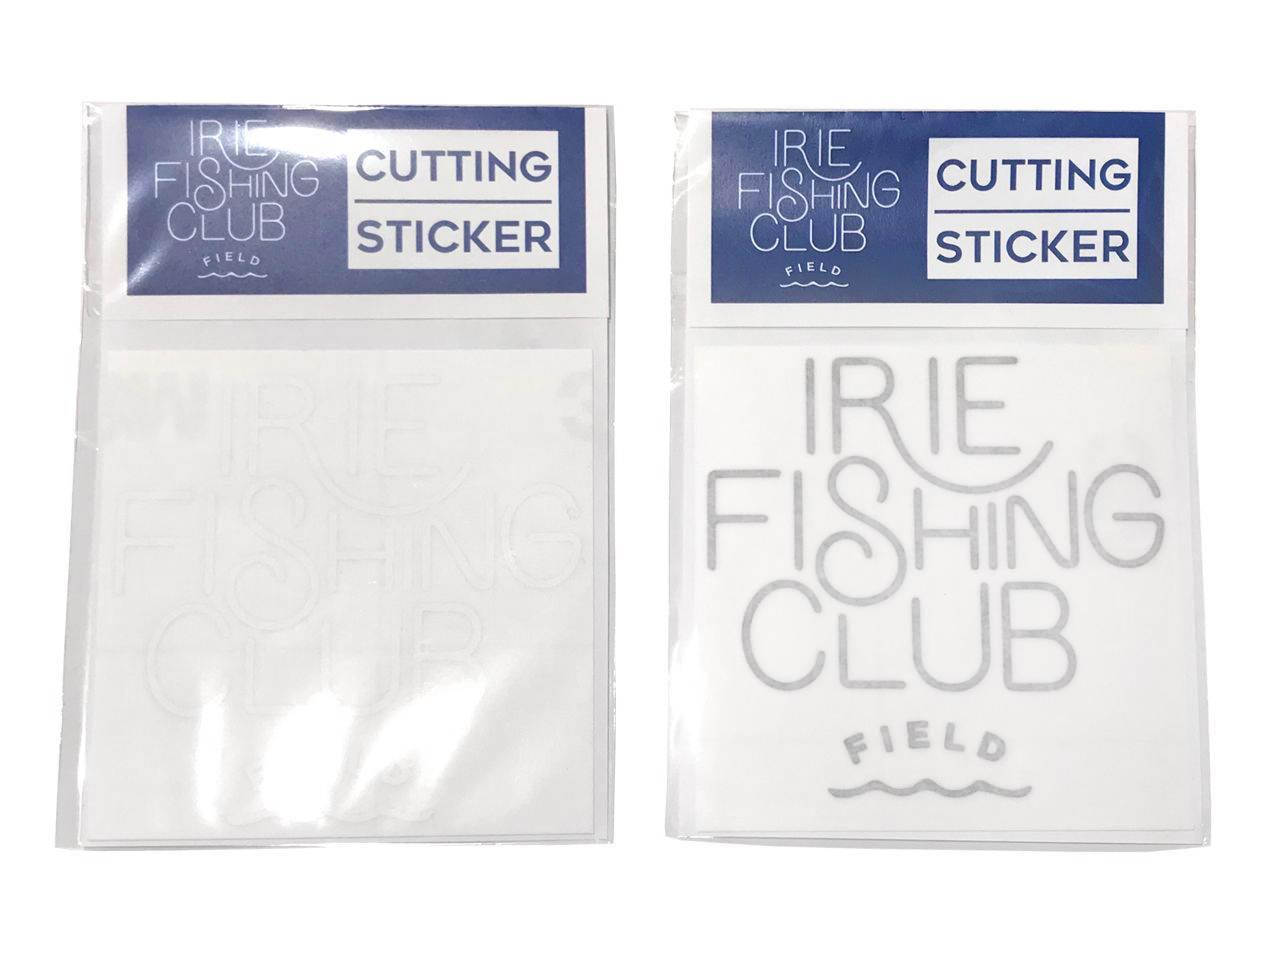 I.F.C SMALL LOGO CUTTING STICKER【S】 -IRIE FISHING CLUB-